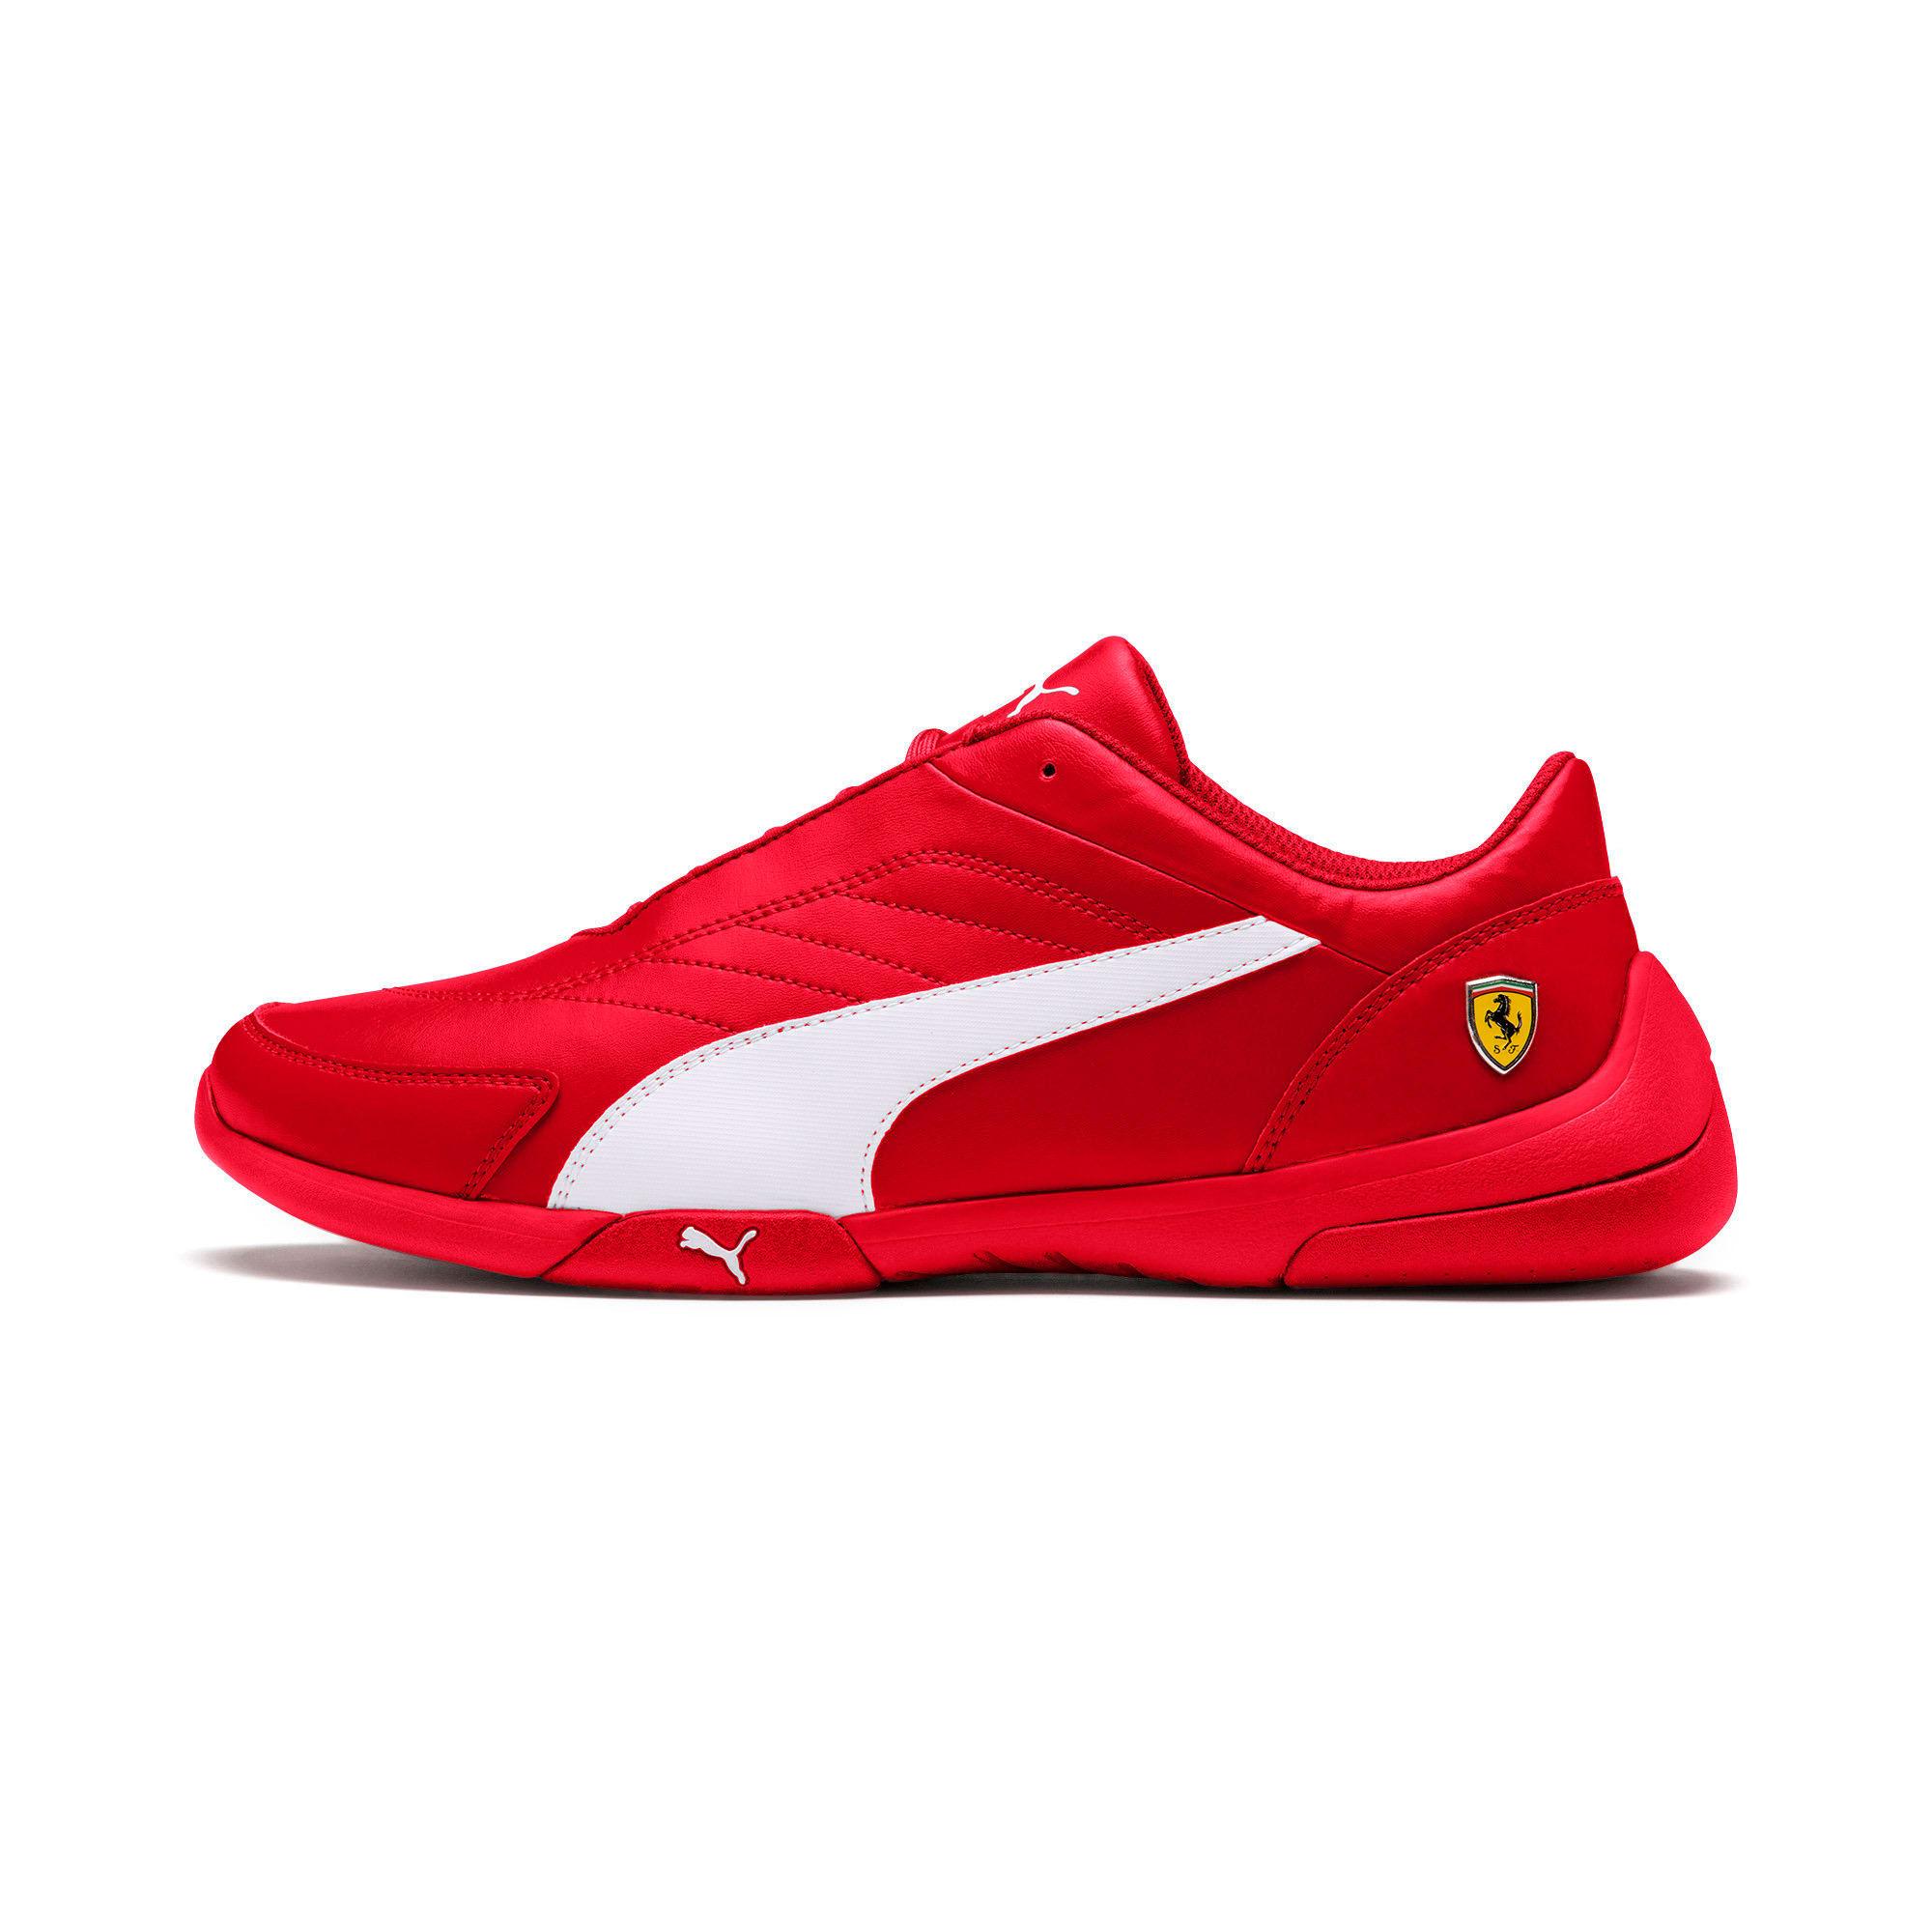 Thumbnail 1 of Scuderia Ferrari Kart Cat III Shoes, Rosso Corsa-White, medium